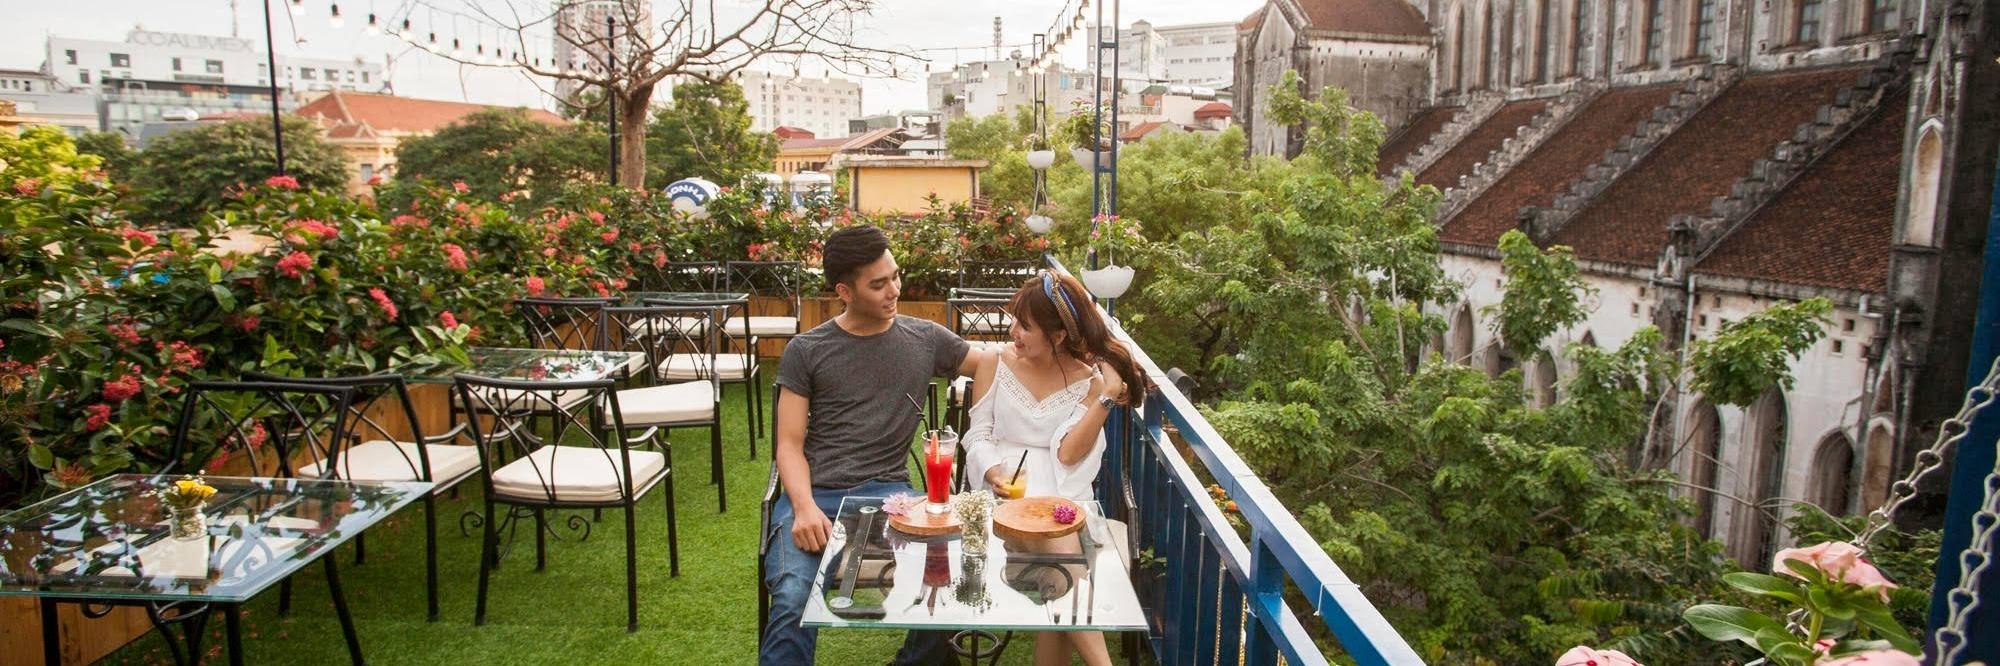 https://gody.vn/blog/nguyentoan04/post/top-nhung-quan-cafe-dep-nhat-ha-noi-2422